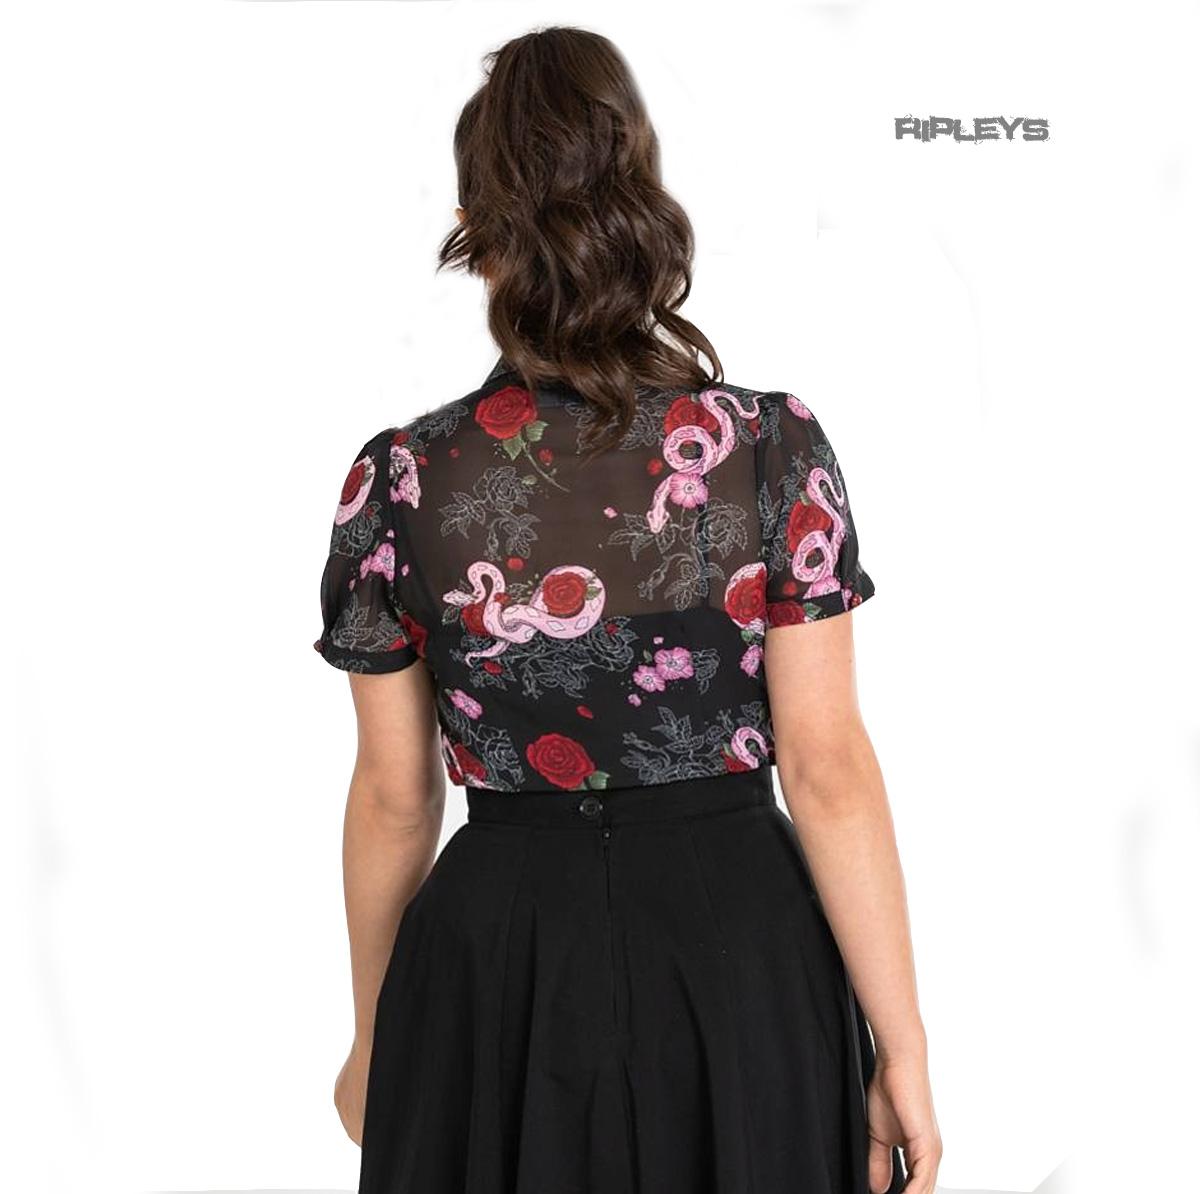 Hell-Bunny-Shirt-Gothic-Black-Top-MEDUSA-Blouse-Snakes-amp-Roses-All-Sizes thumbnail 16